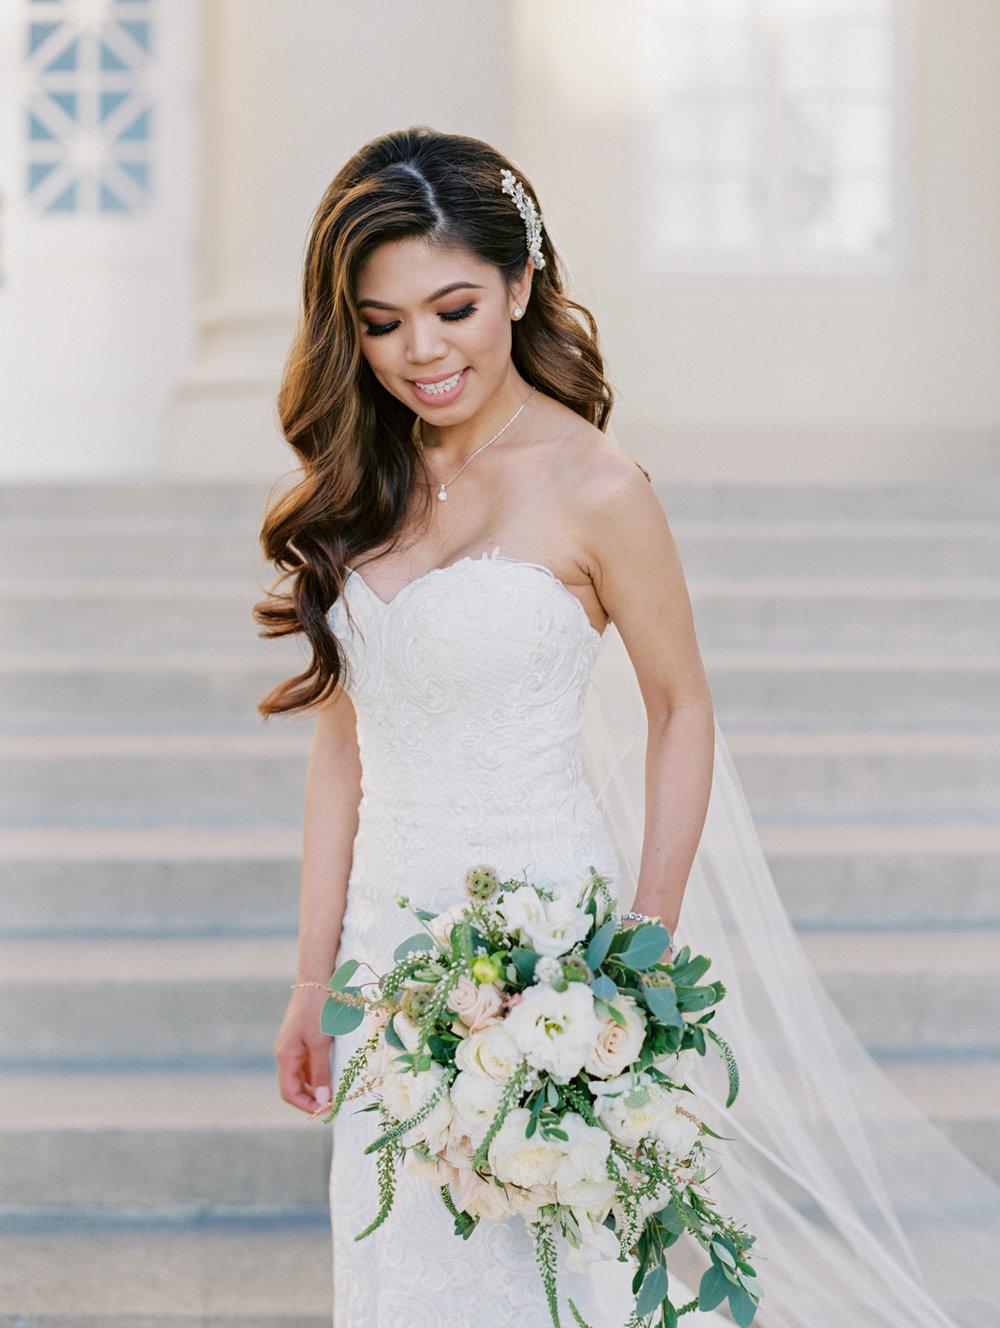 ChristineDomJonCu-Film-Wedding-Photographer71.jpg